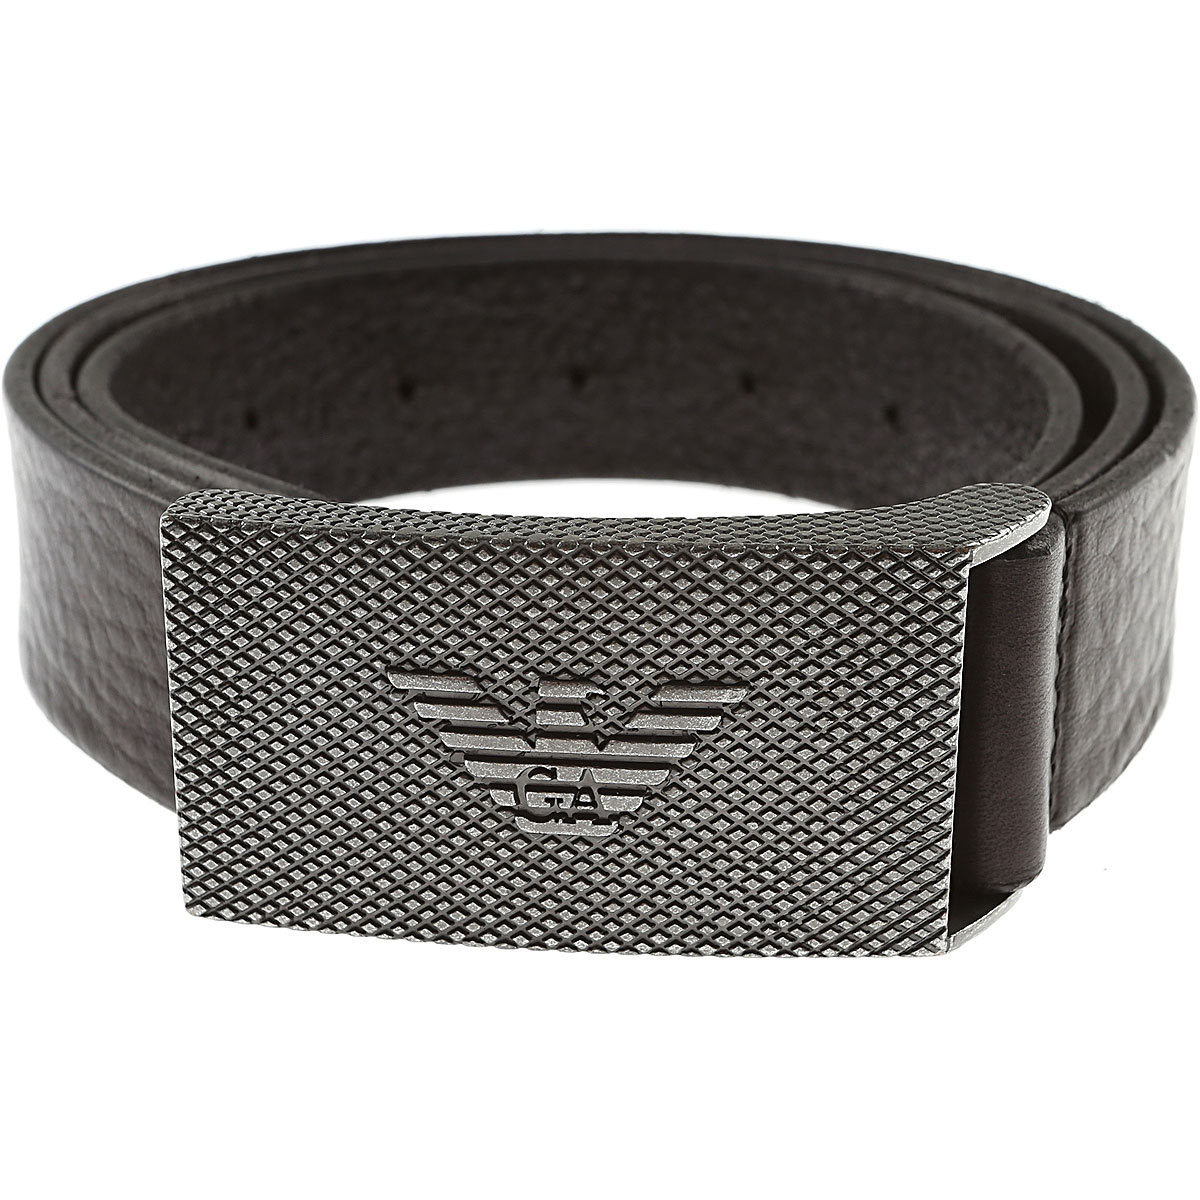 7042a6327b Mens Belts Emporio Armani, Style code: y4s218-ycm4g-8001